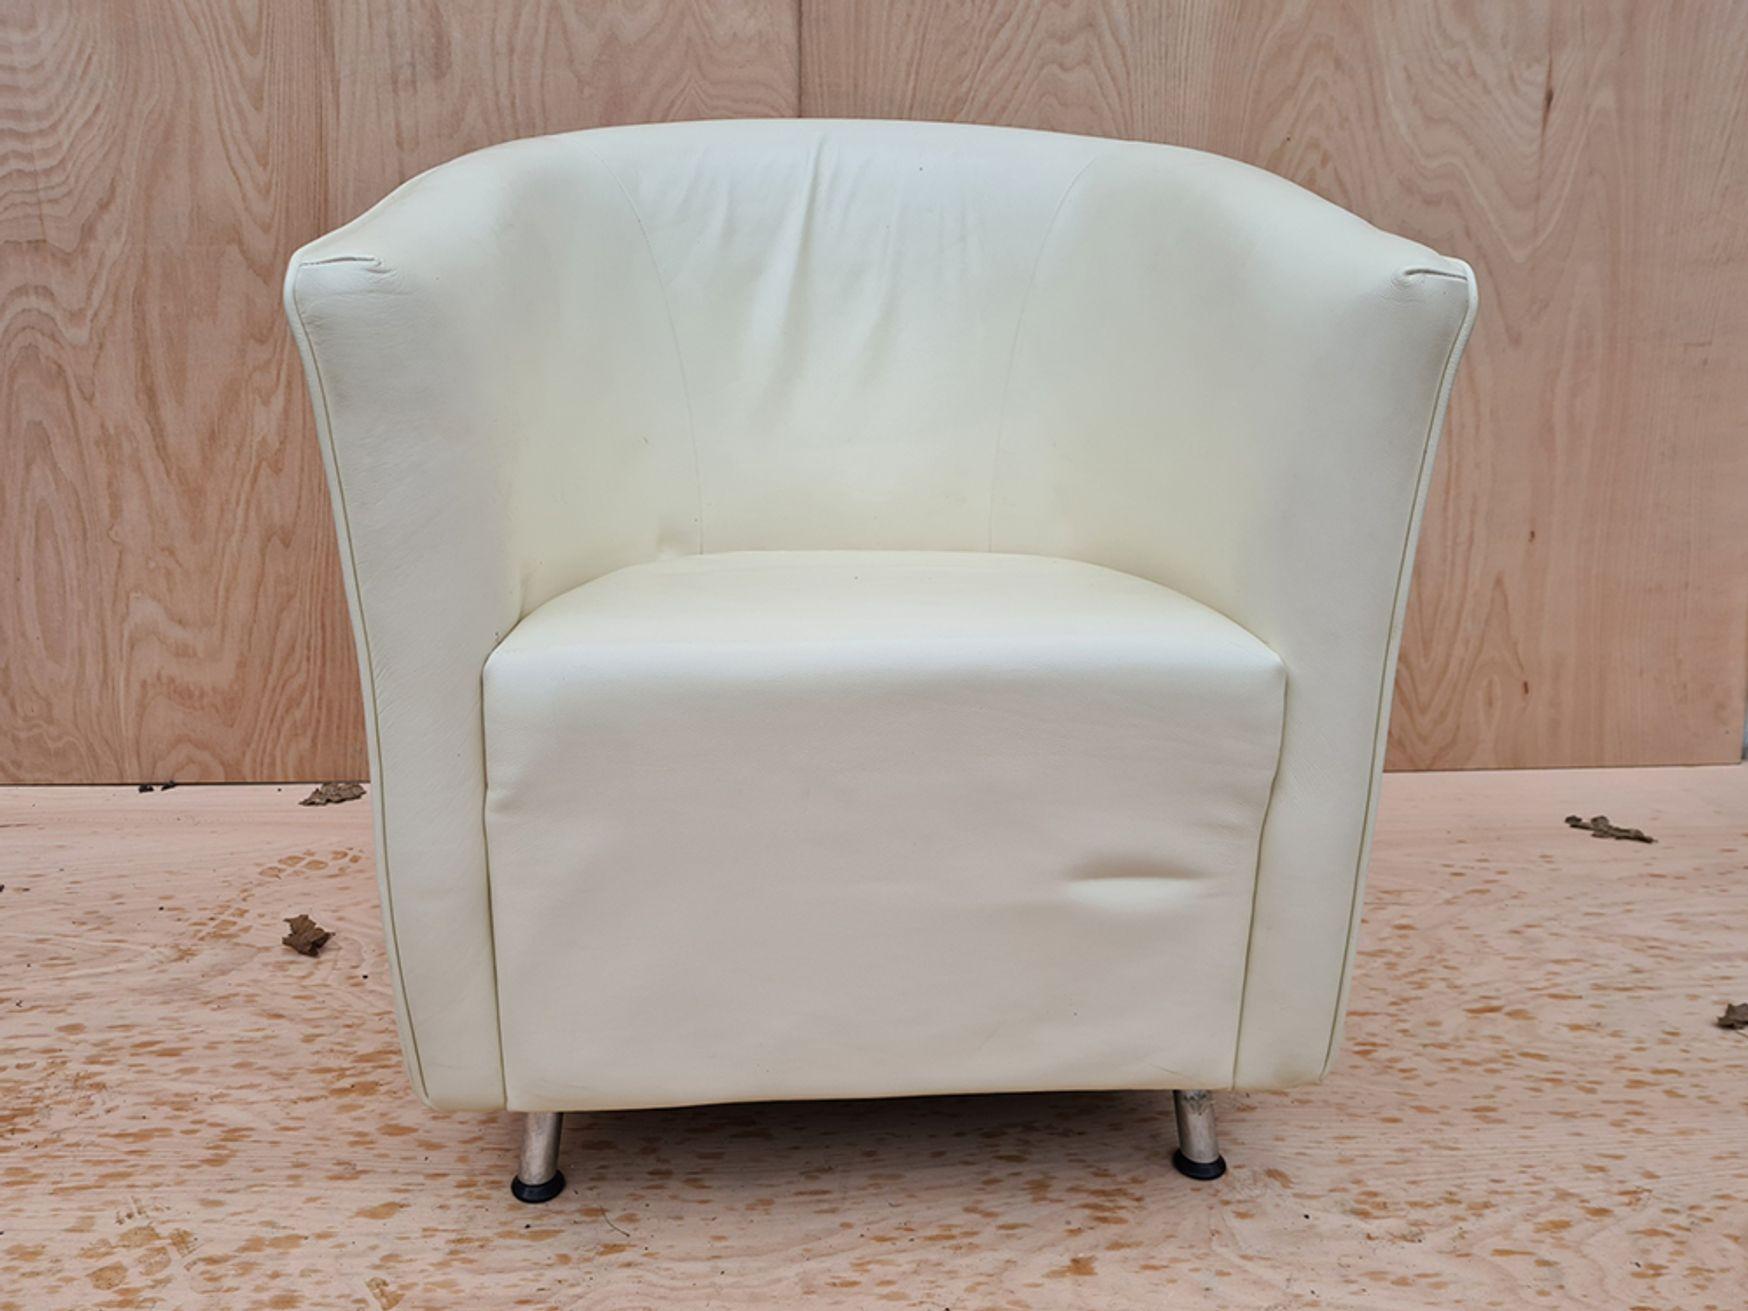 Used Orangebox 'Abbey' Cream Leather Armchair